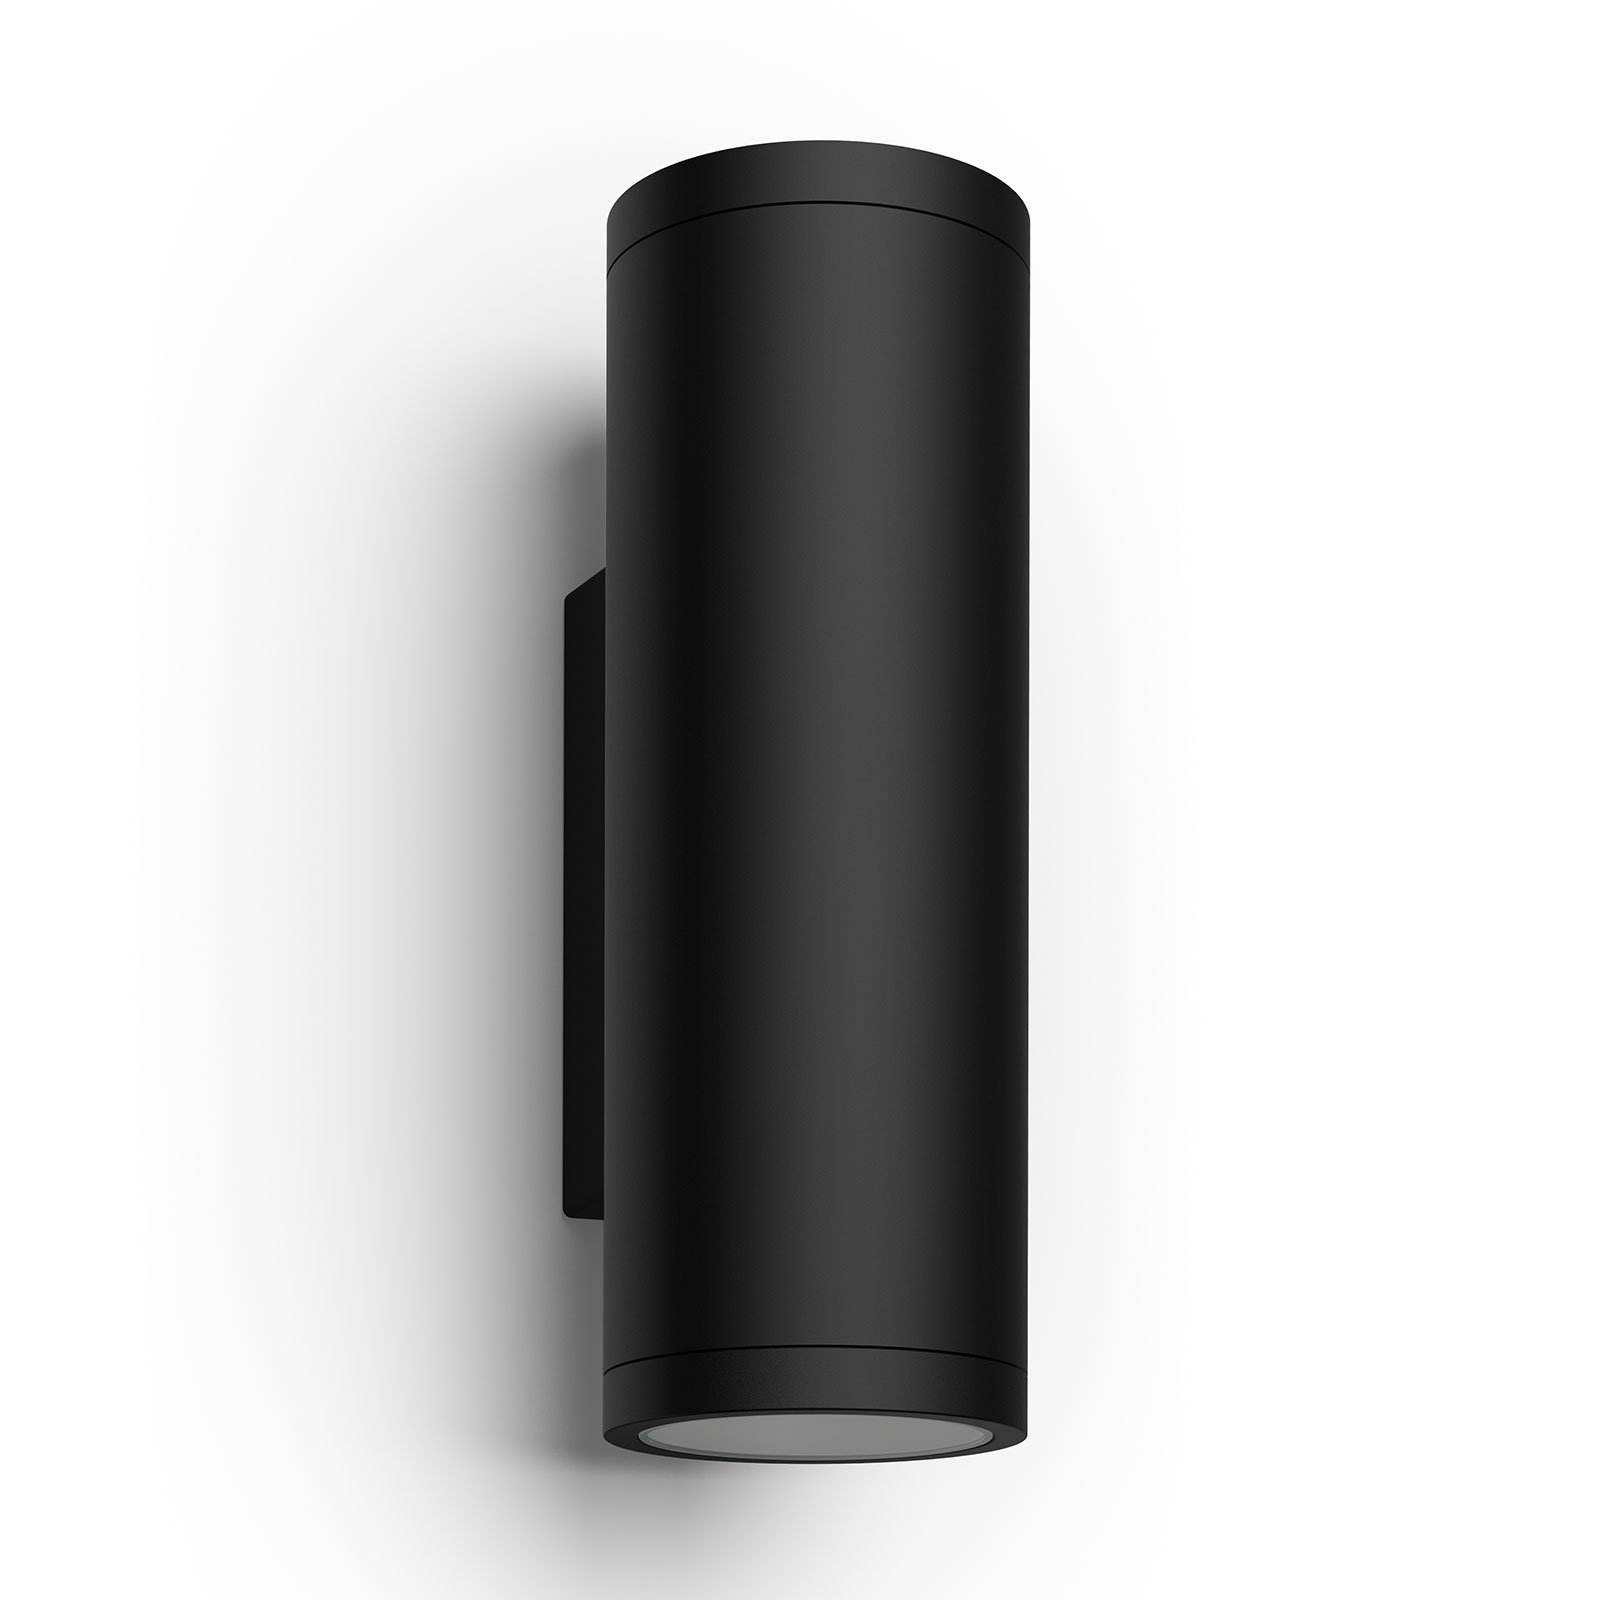 Philips Hue WACA Appear LED-Außenwandlampe schwarz